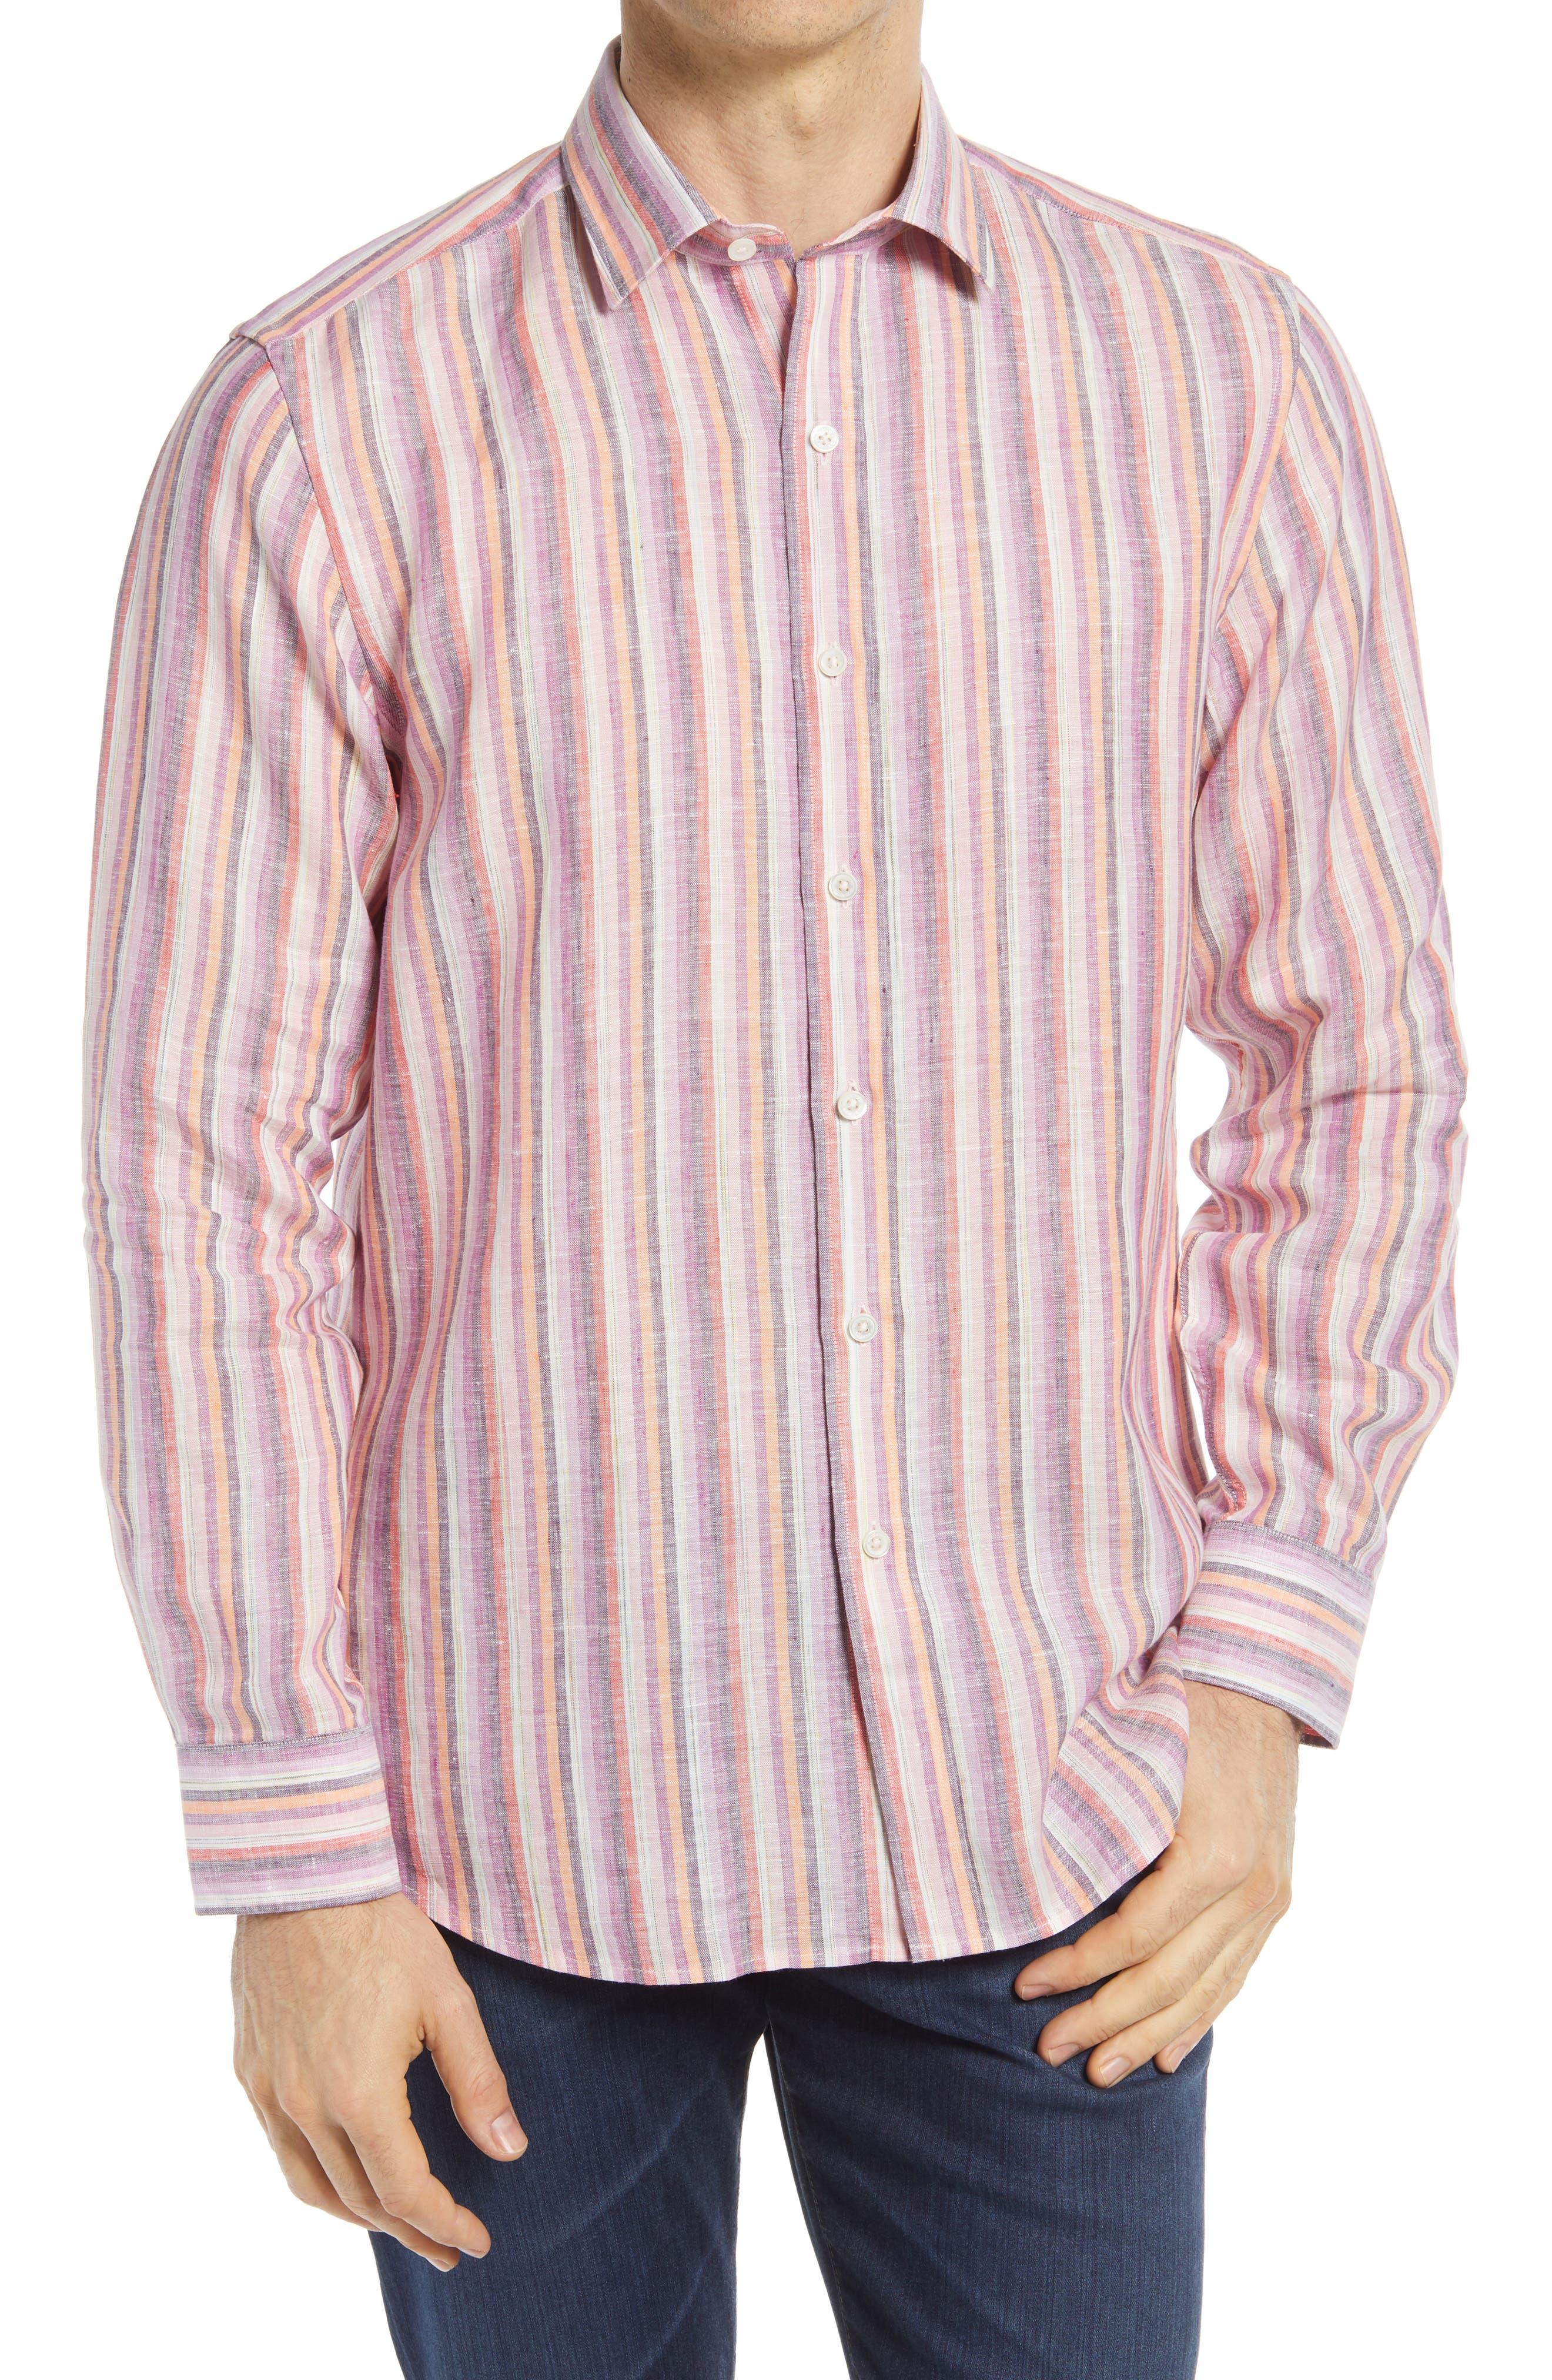 Shaped Fit Stripe Linen Button-Up Shirt